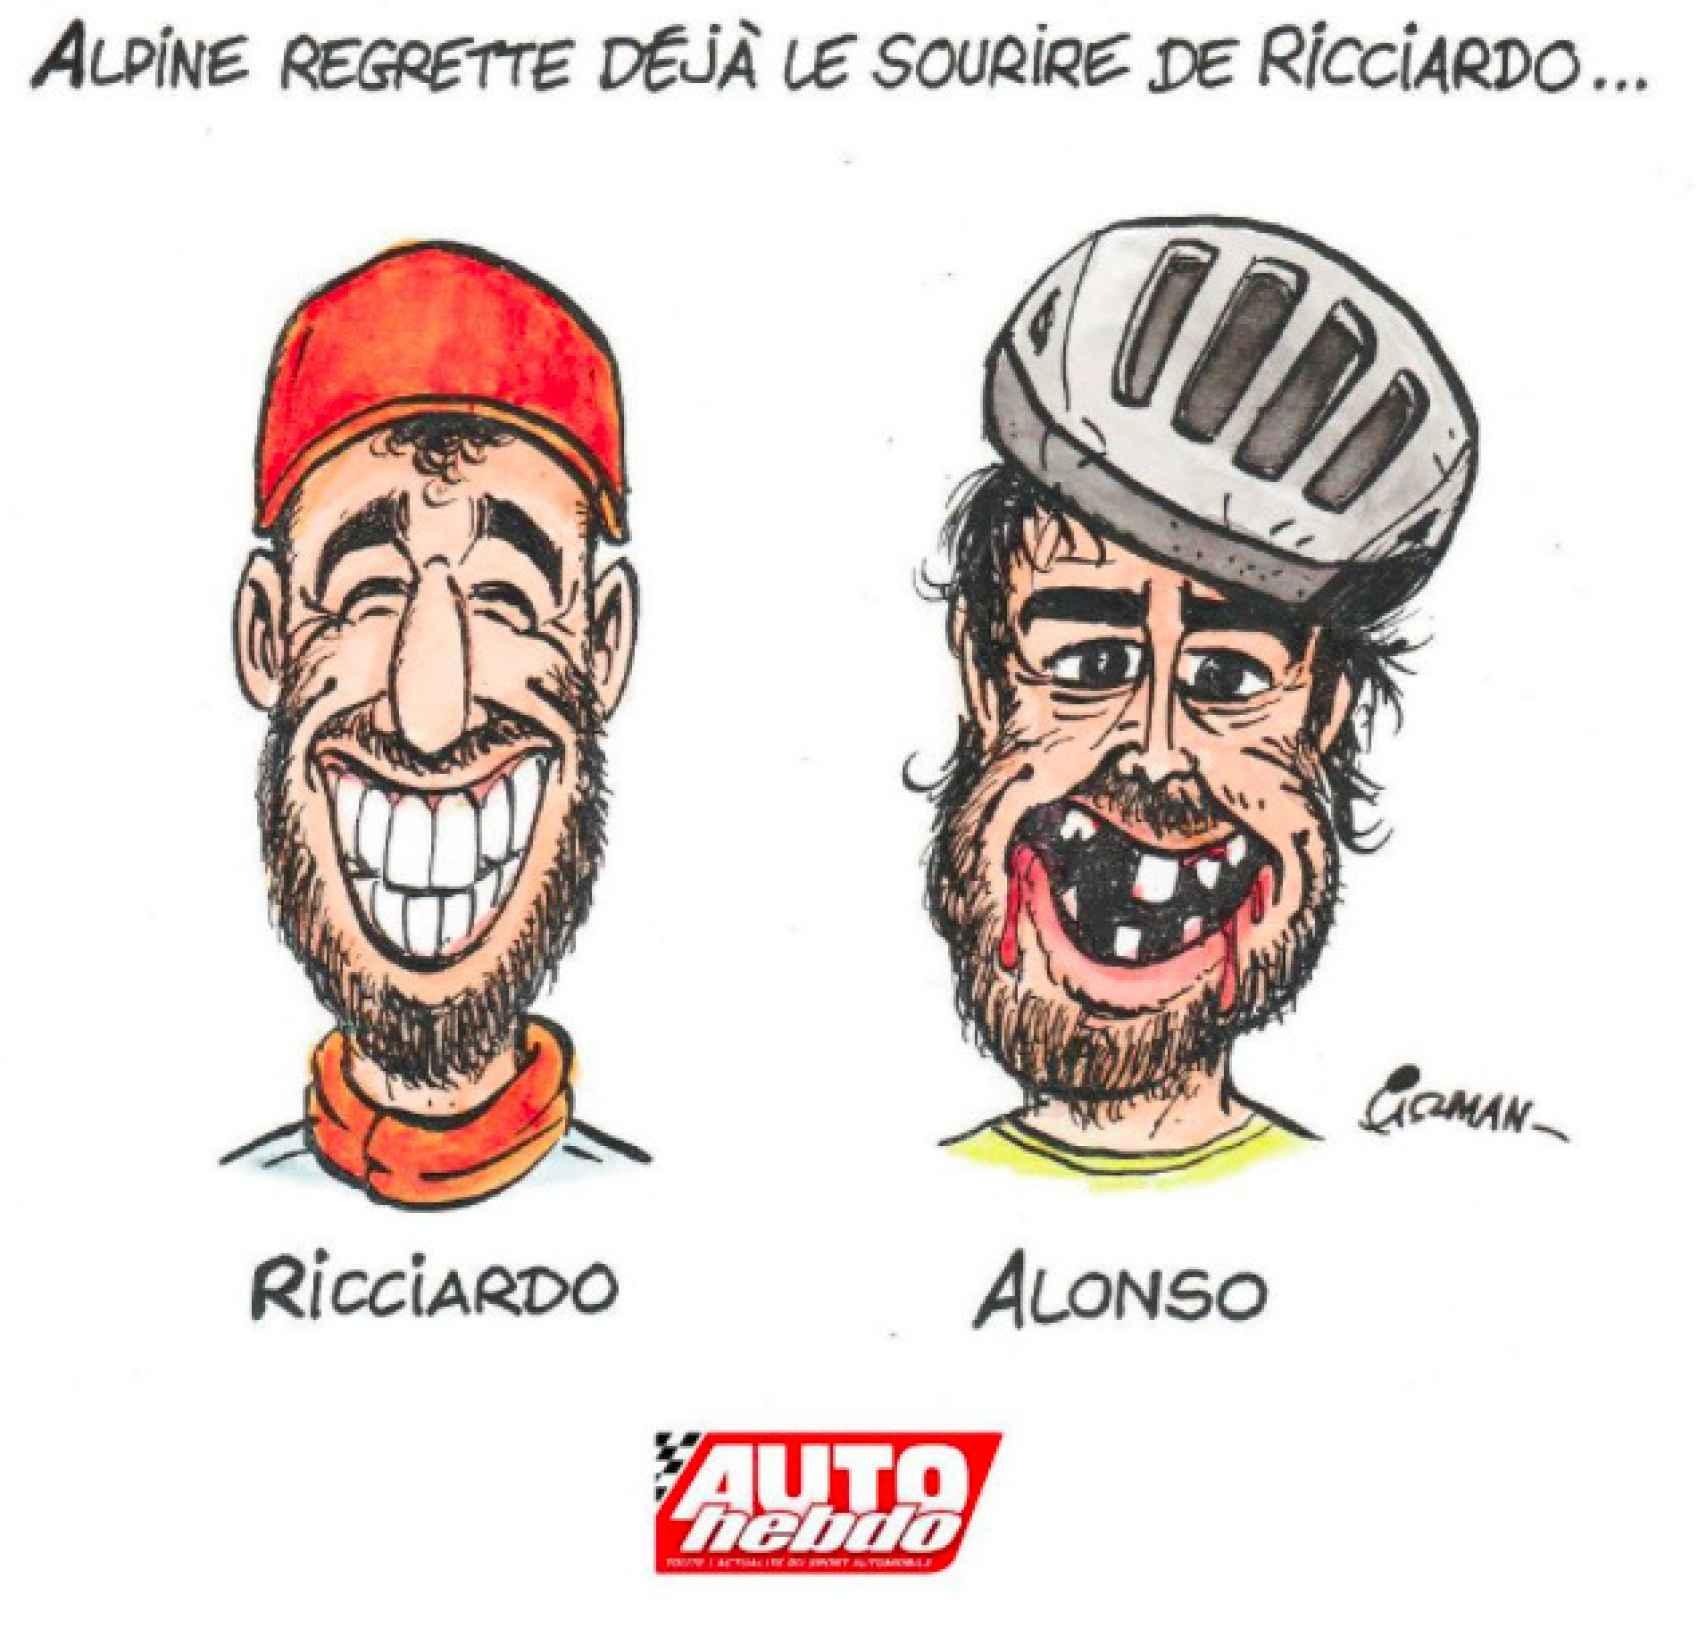 La caricatura francesa burlándose de Fernando Alonso